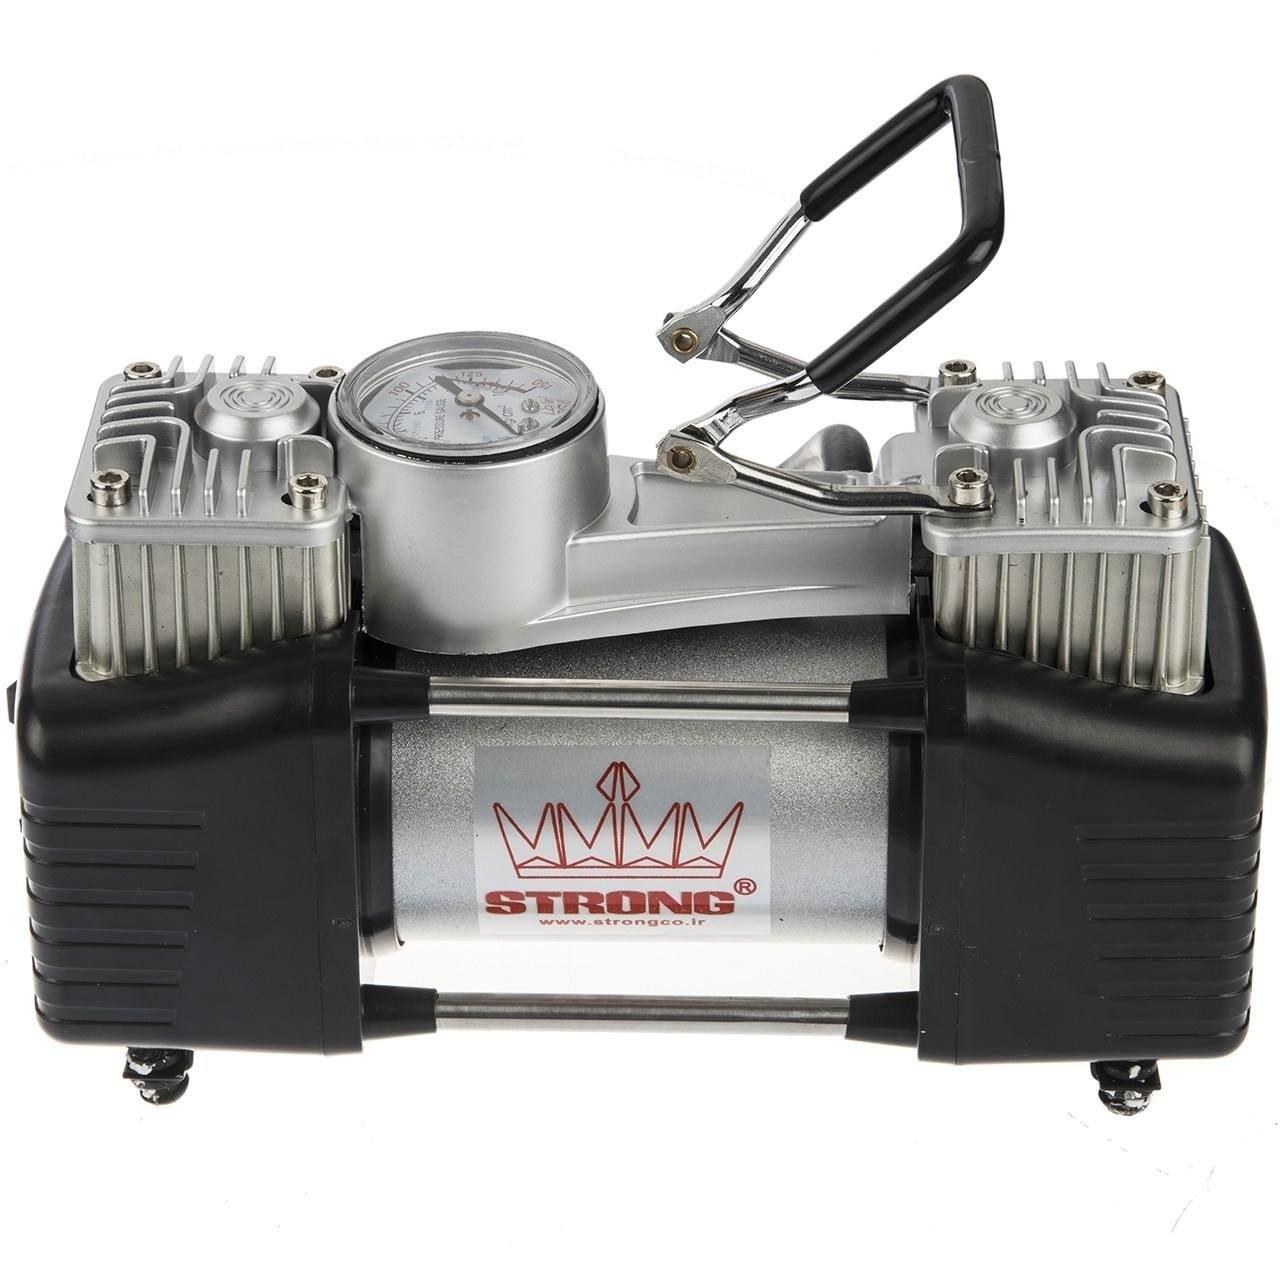 تصویر کمپرسور هوای استرانگ مدل STG-2000 Strong STG-2000 Air Compressor